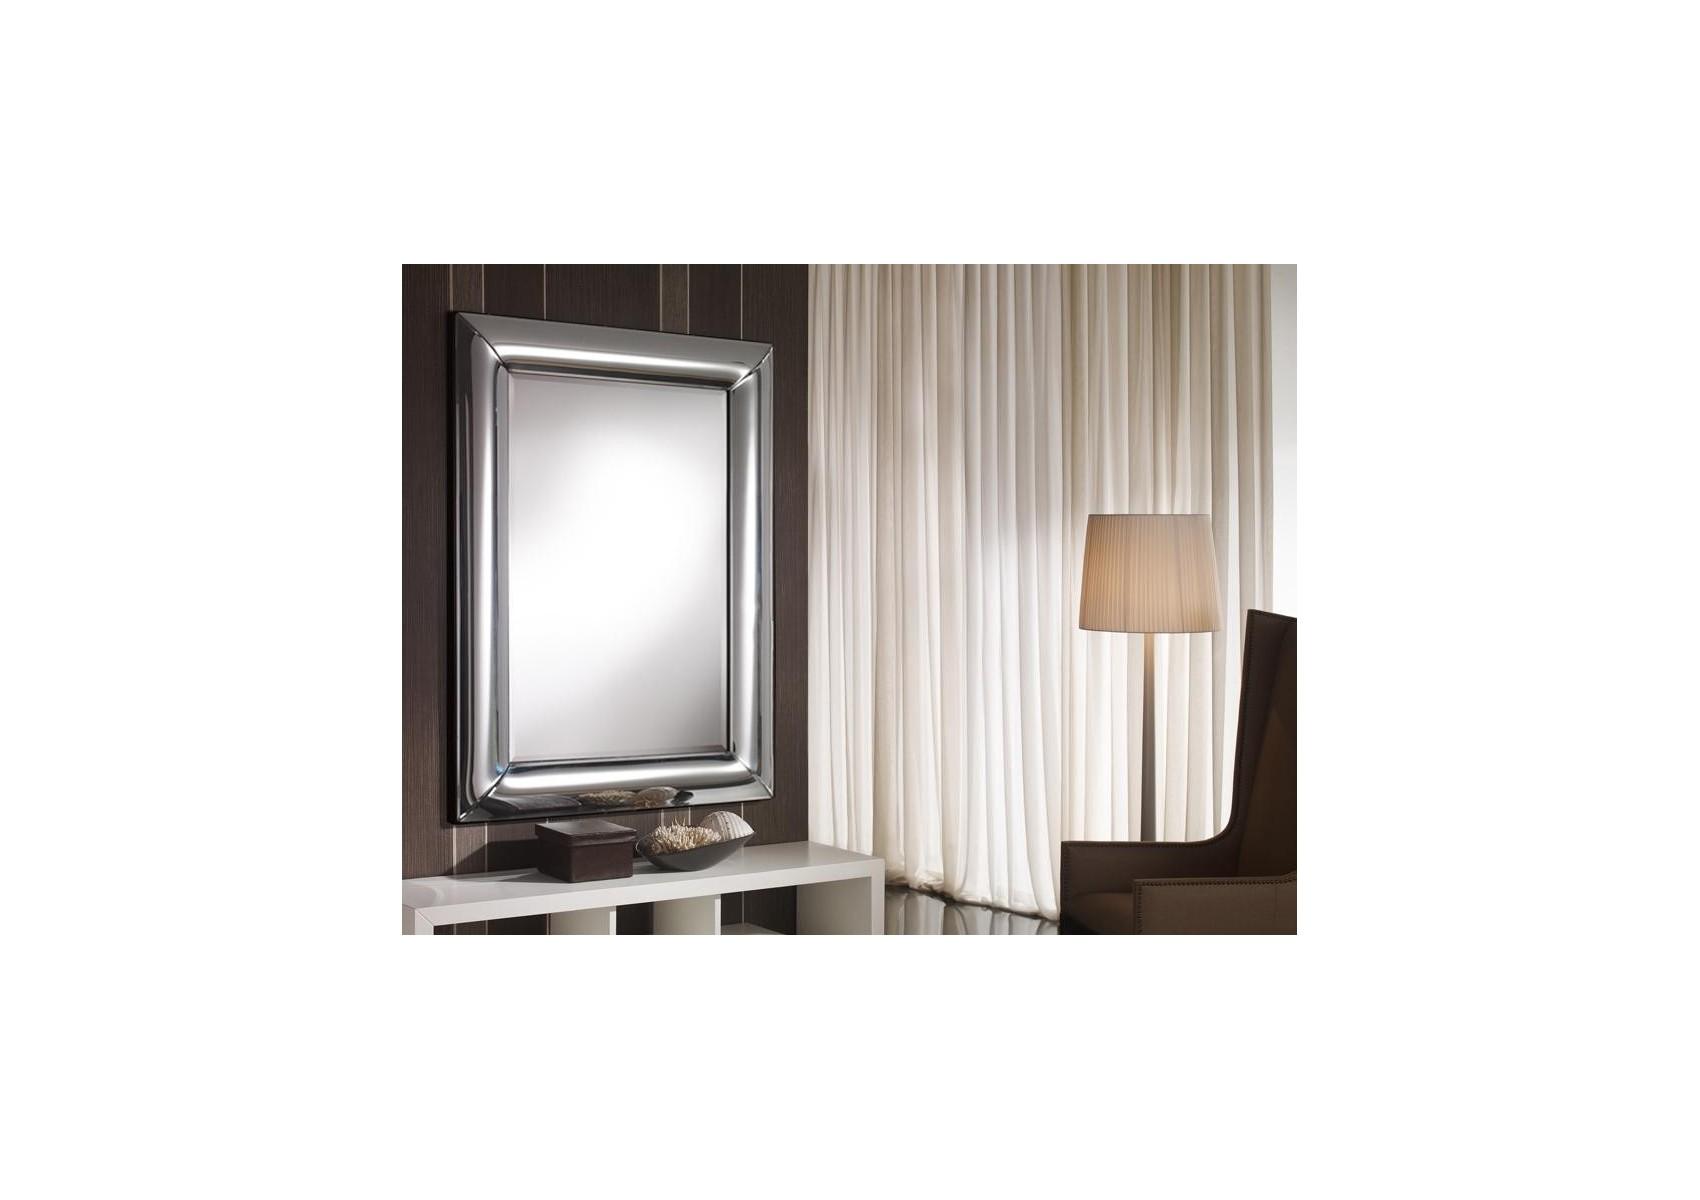 Miroir design Curves - deco originale schuller